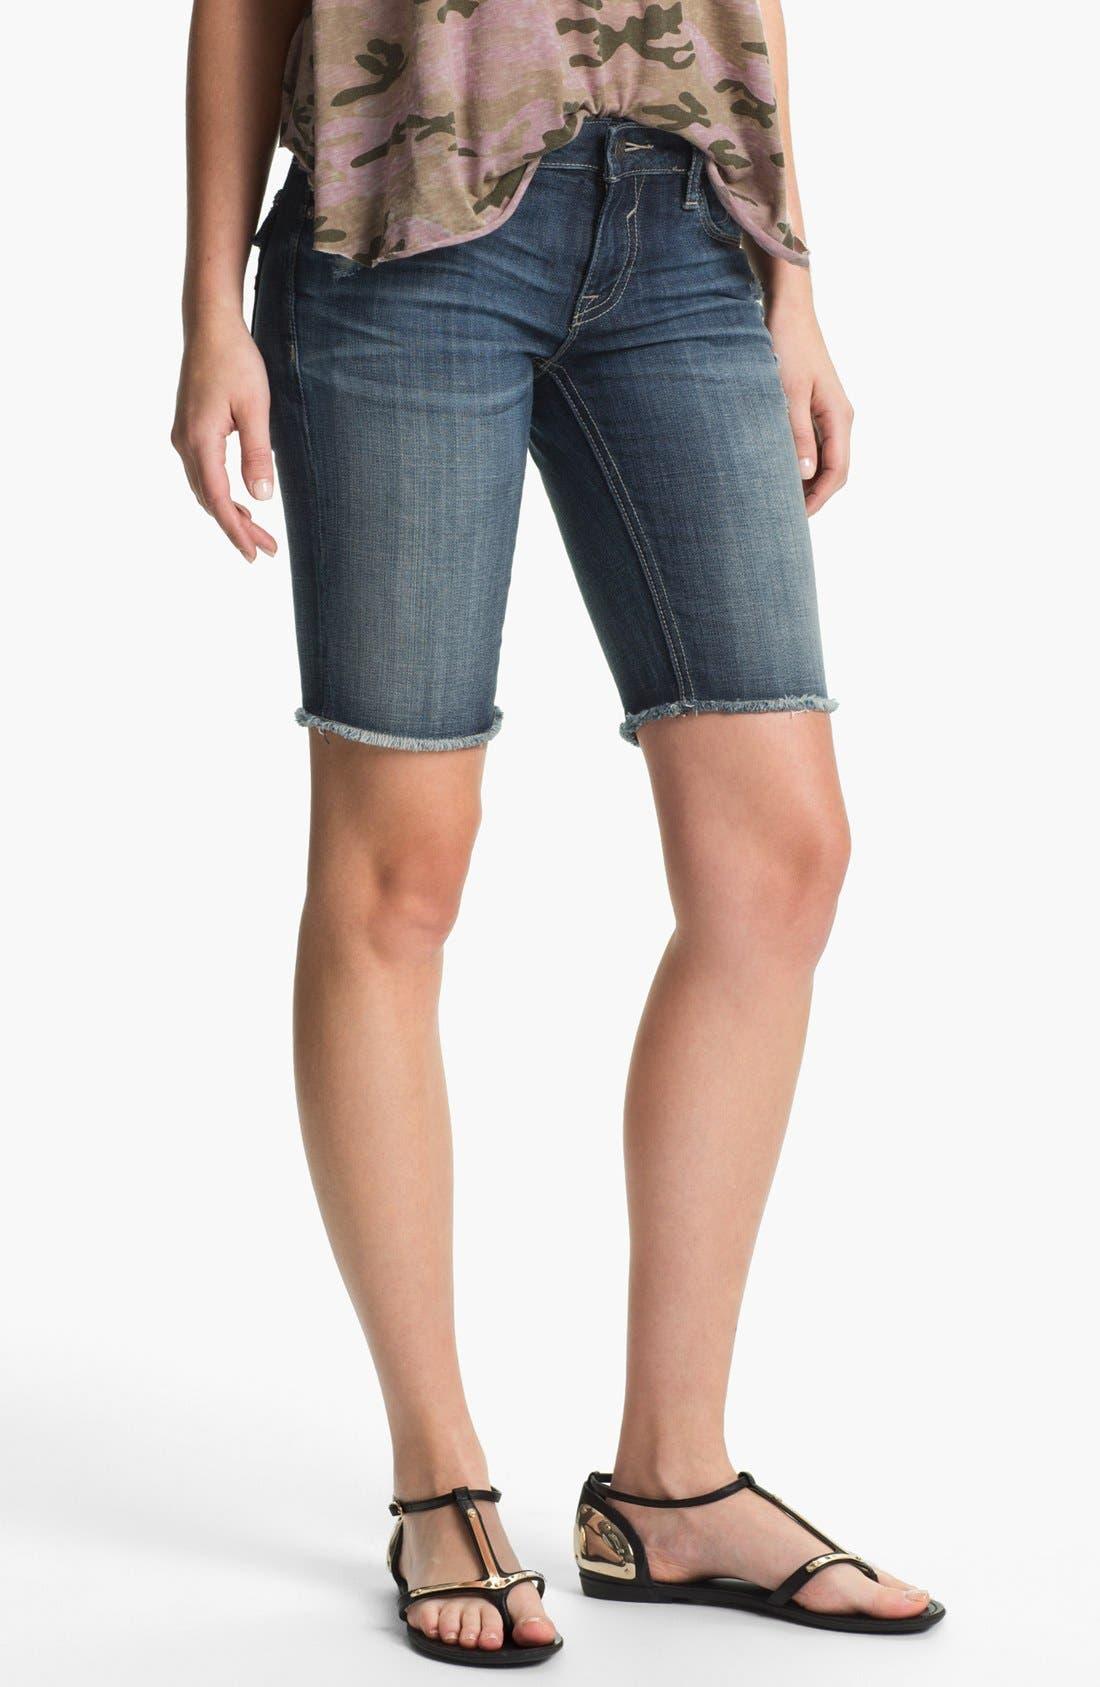 Alternate Image 1 Selected - Vigoss 'New York' Cutoff Denim Bermuda Shorts (Juniors)